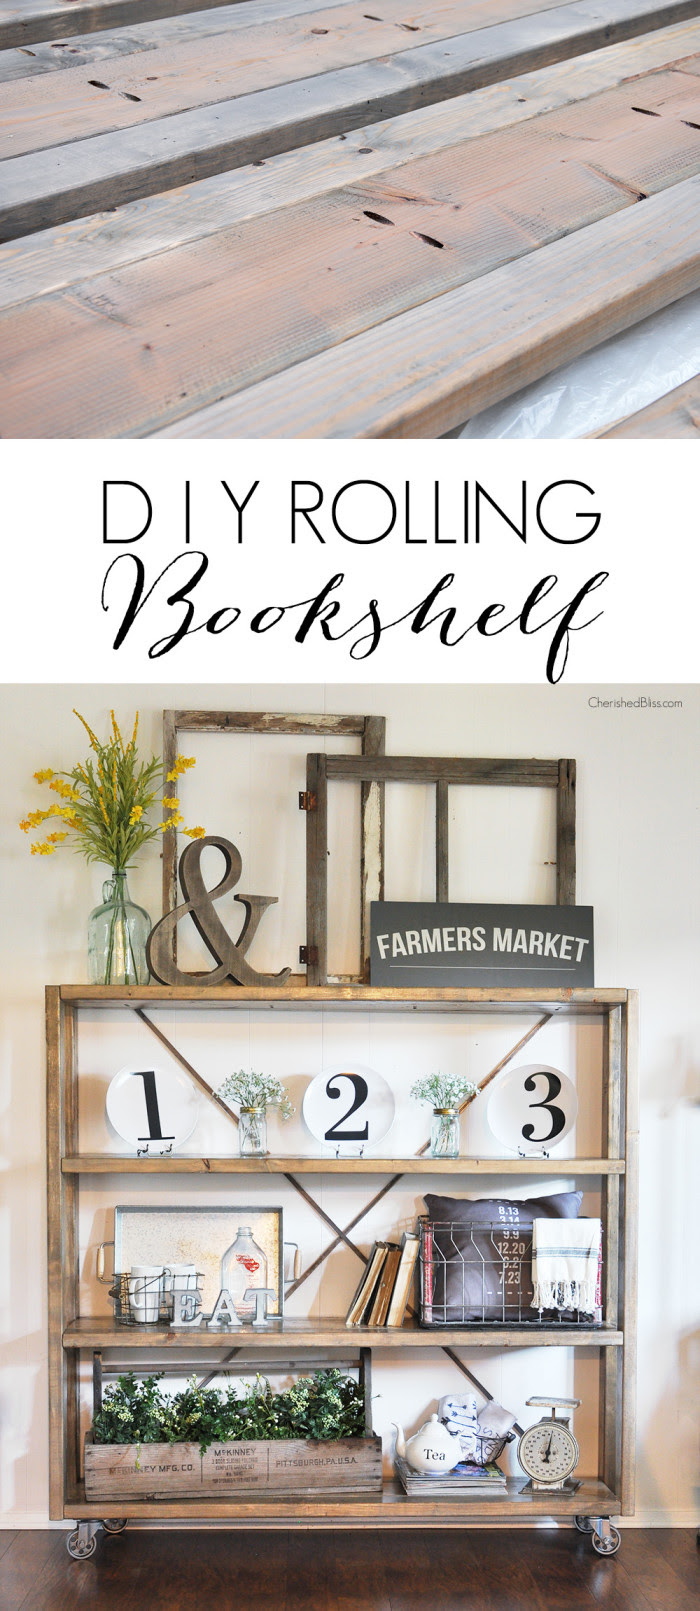 DIY-Rolling-Bookshelf-700x1611